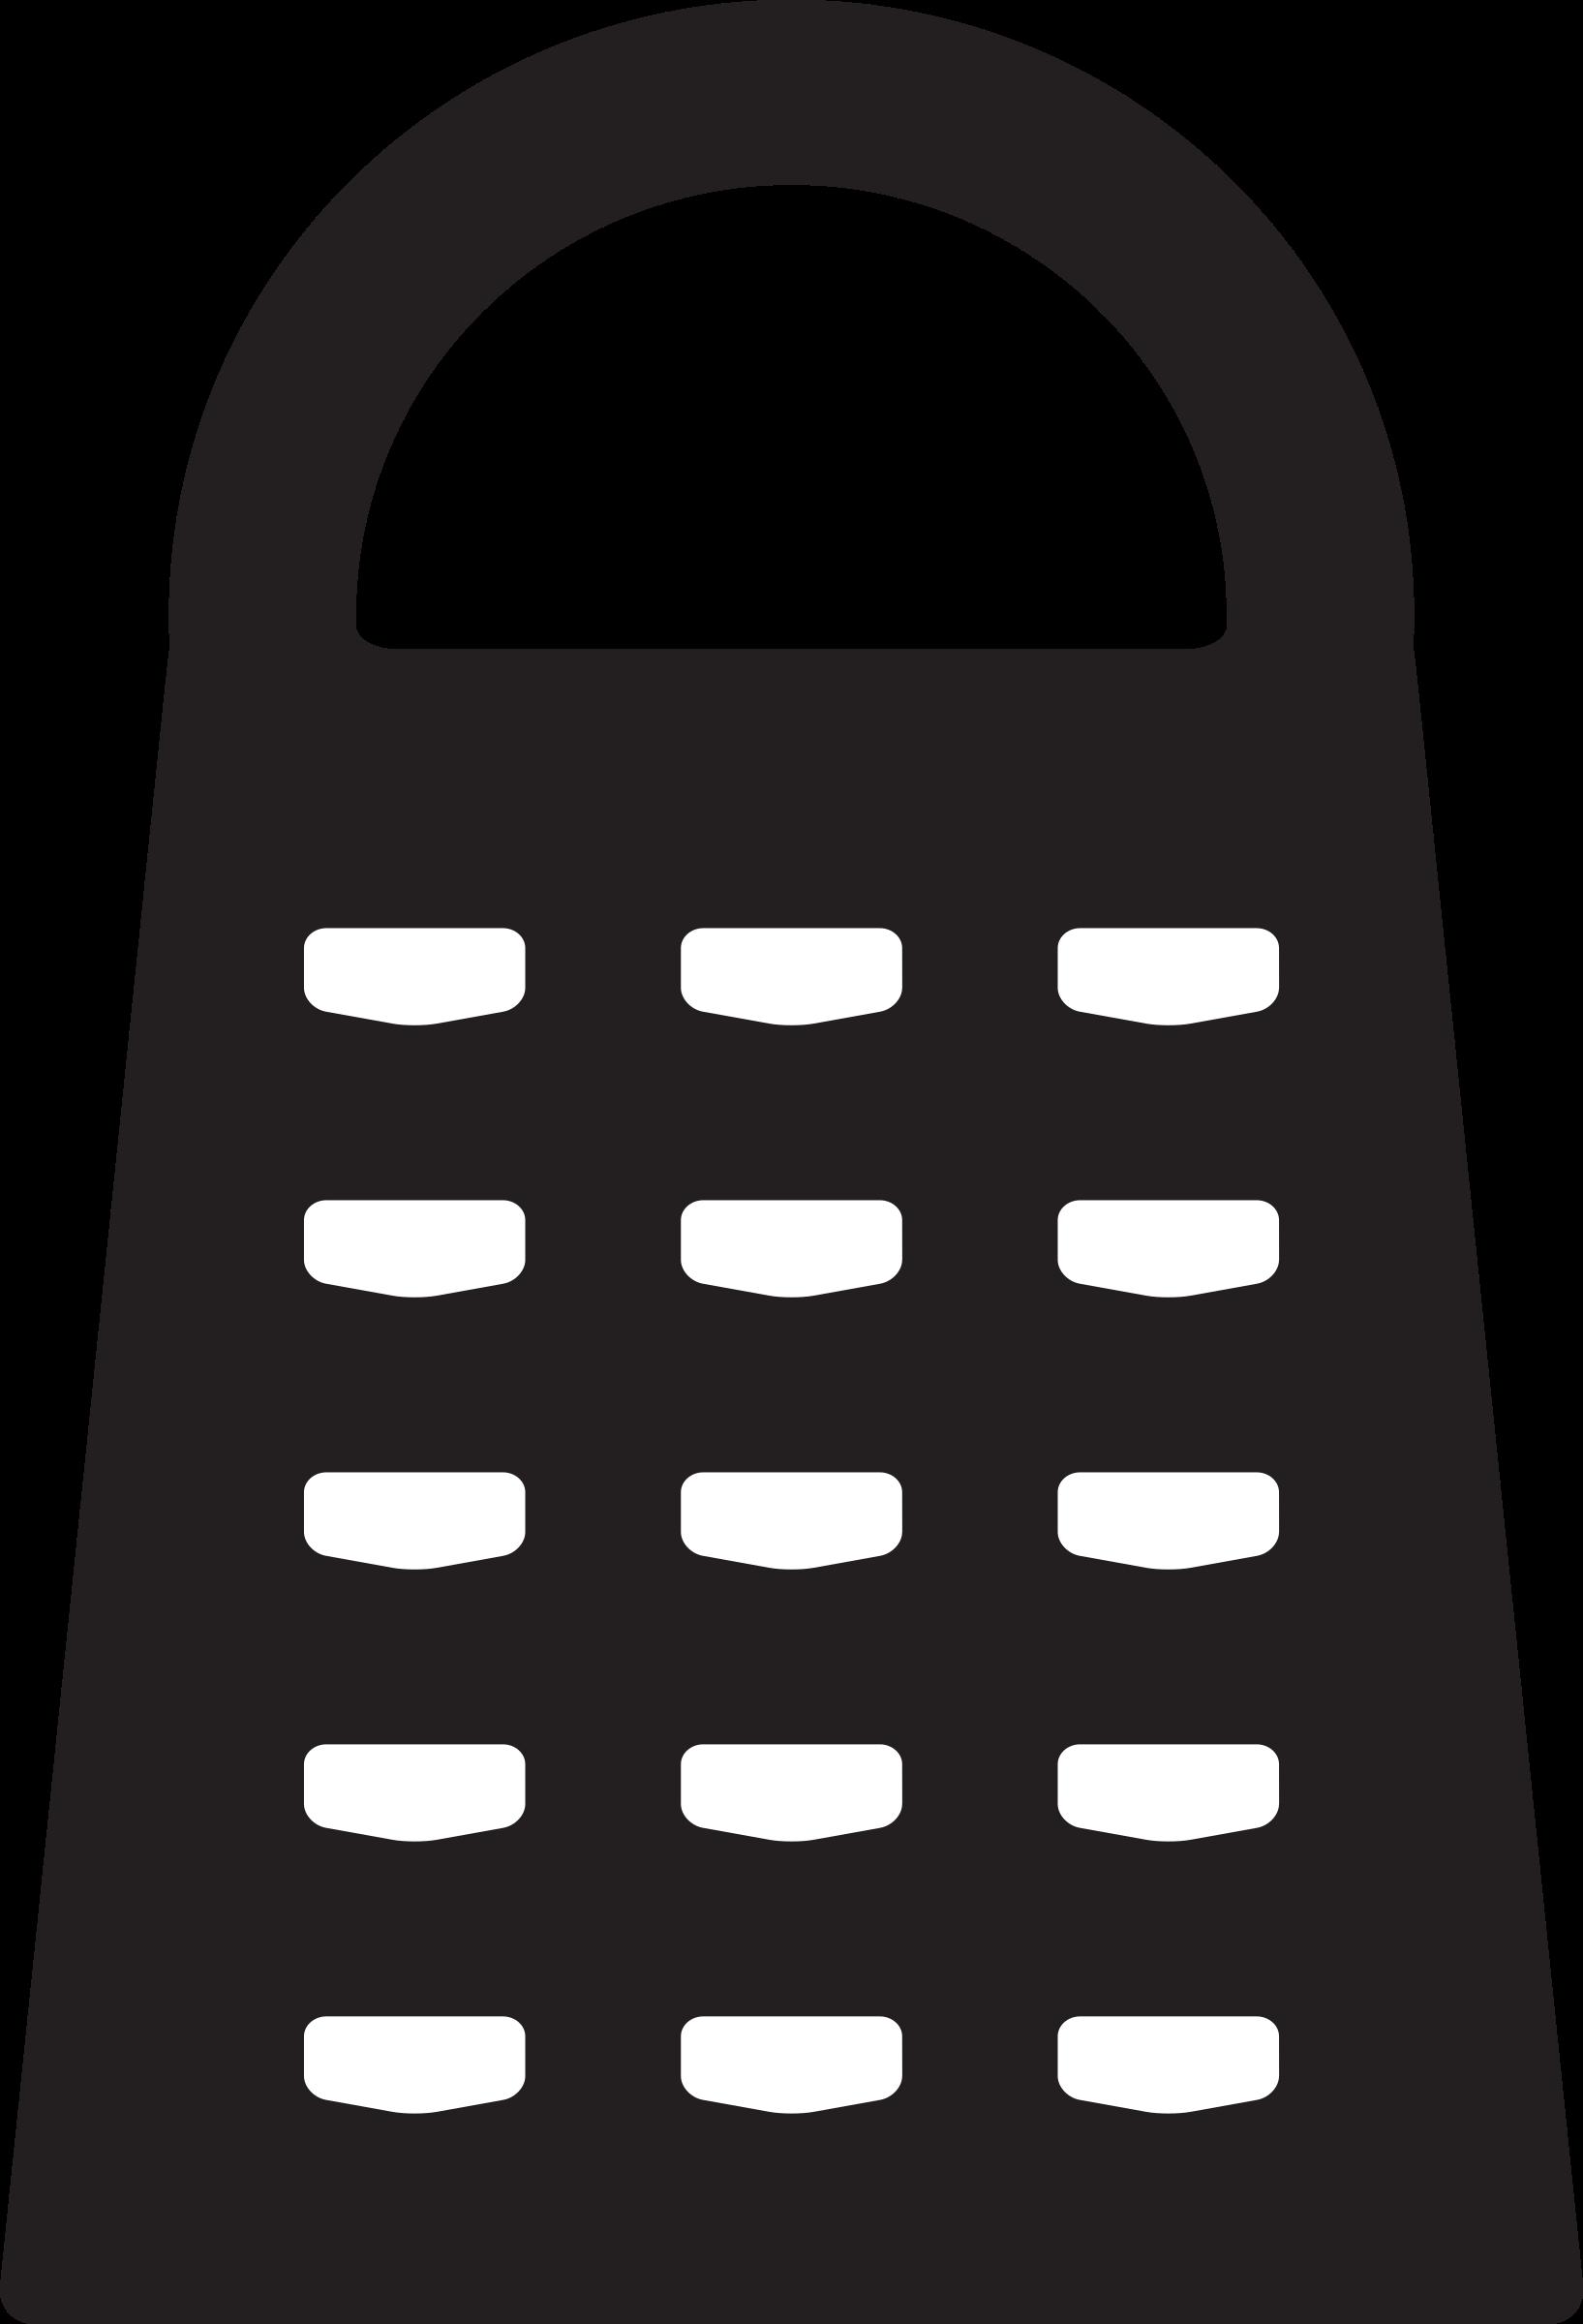 clipart - kitchen icon